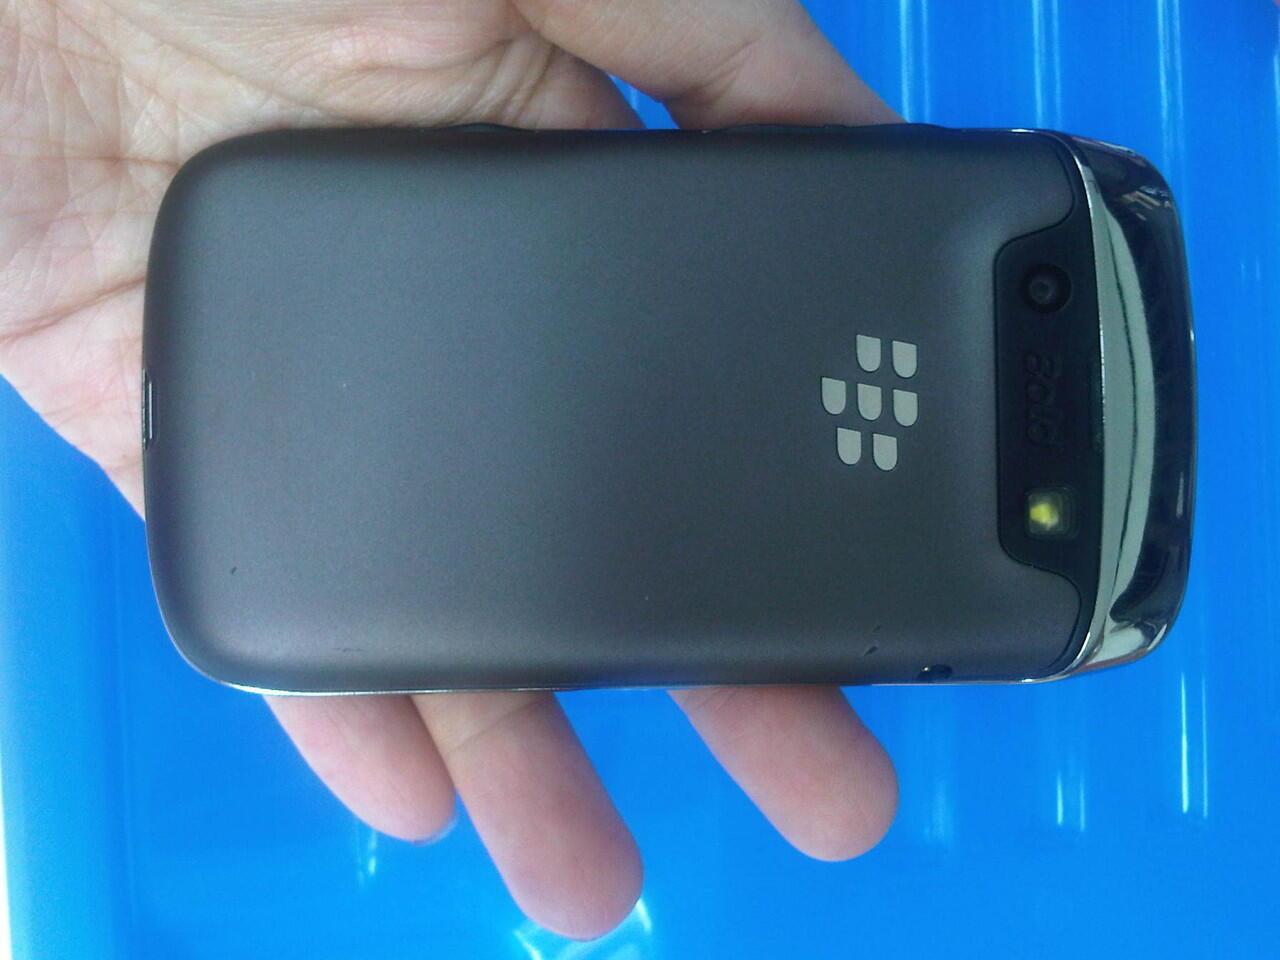 Second Garansi SS Blackberry Bellagio 9790